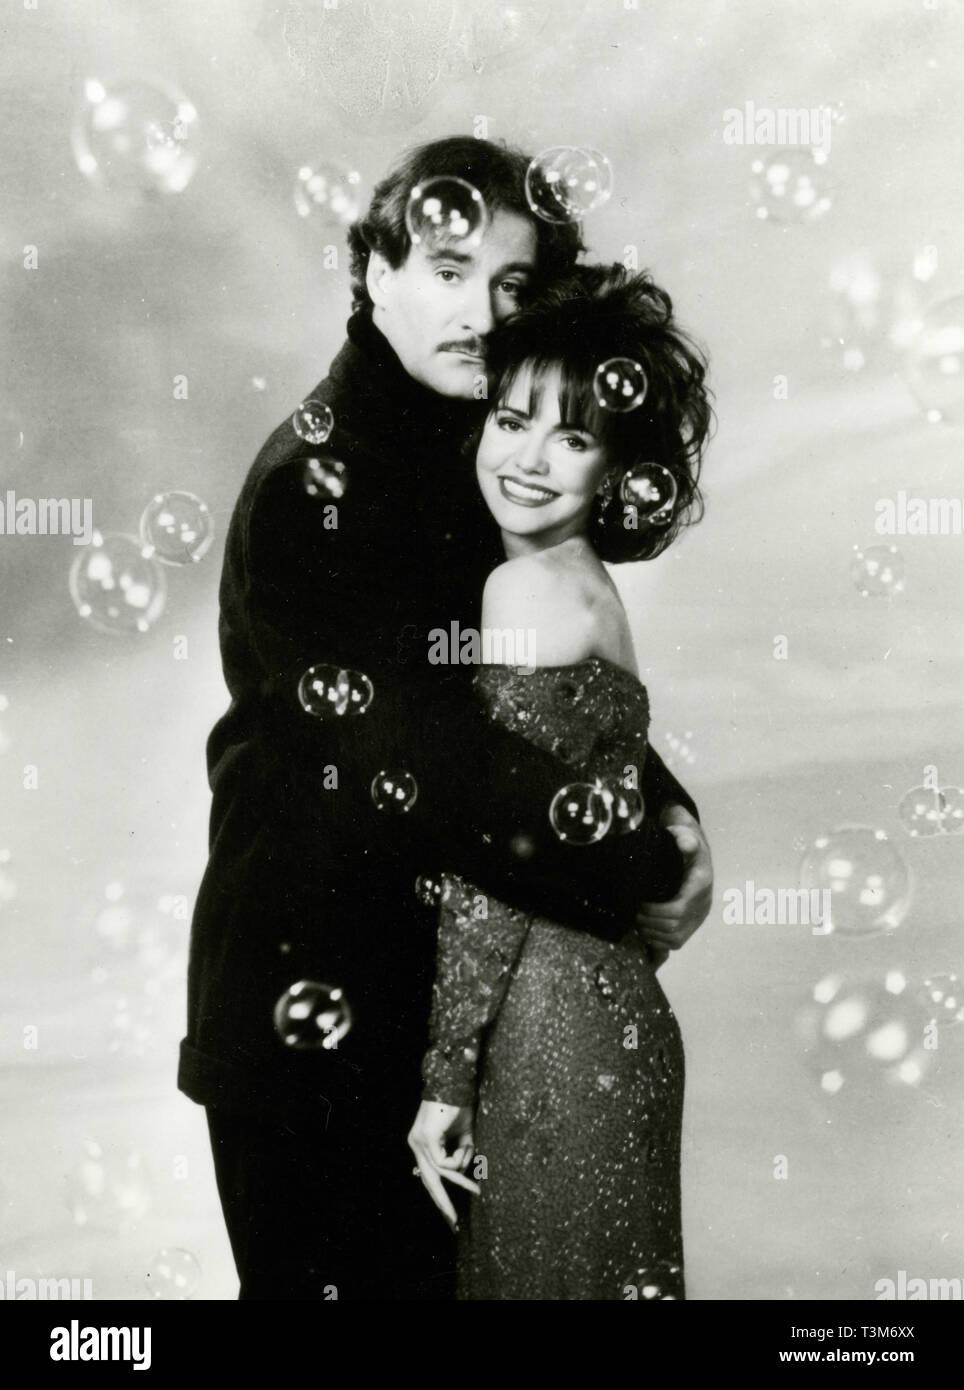 soapdish 1991 full movie